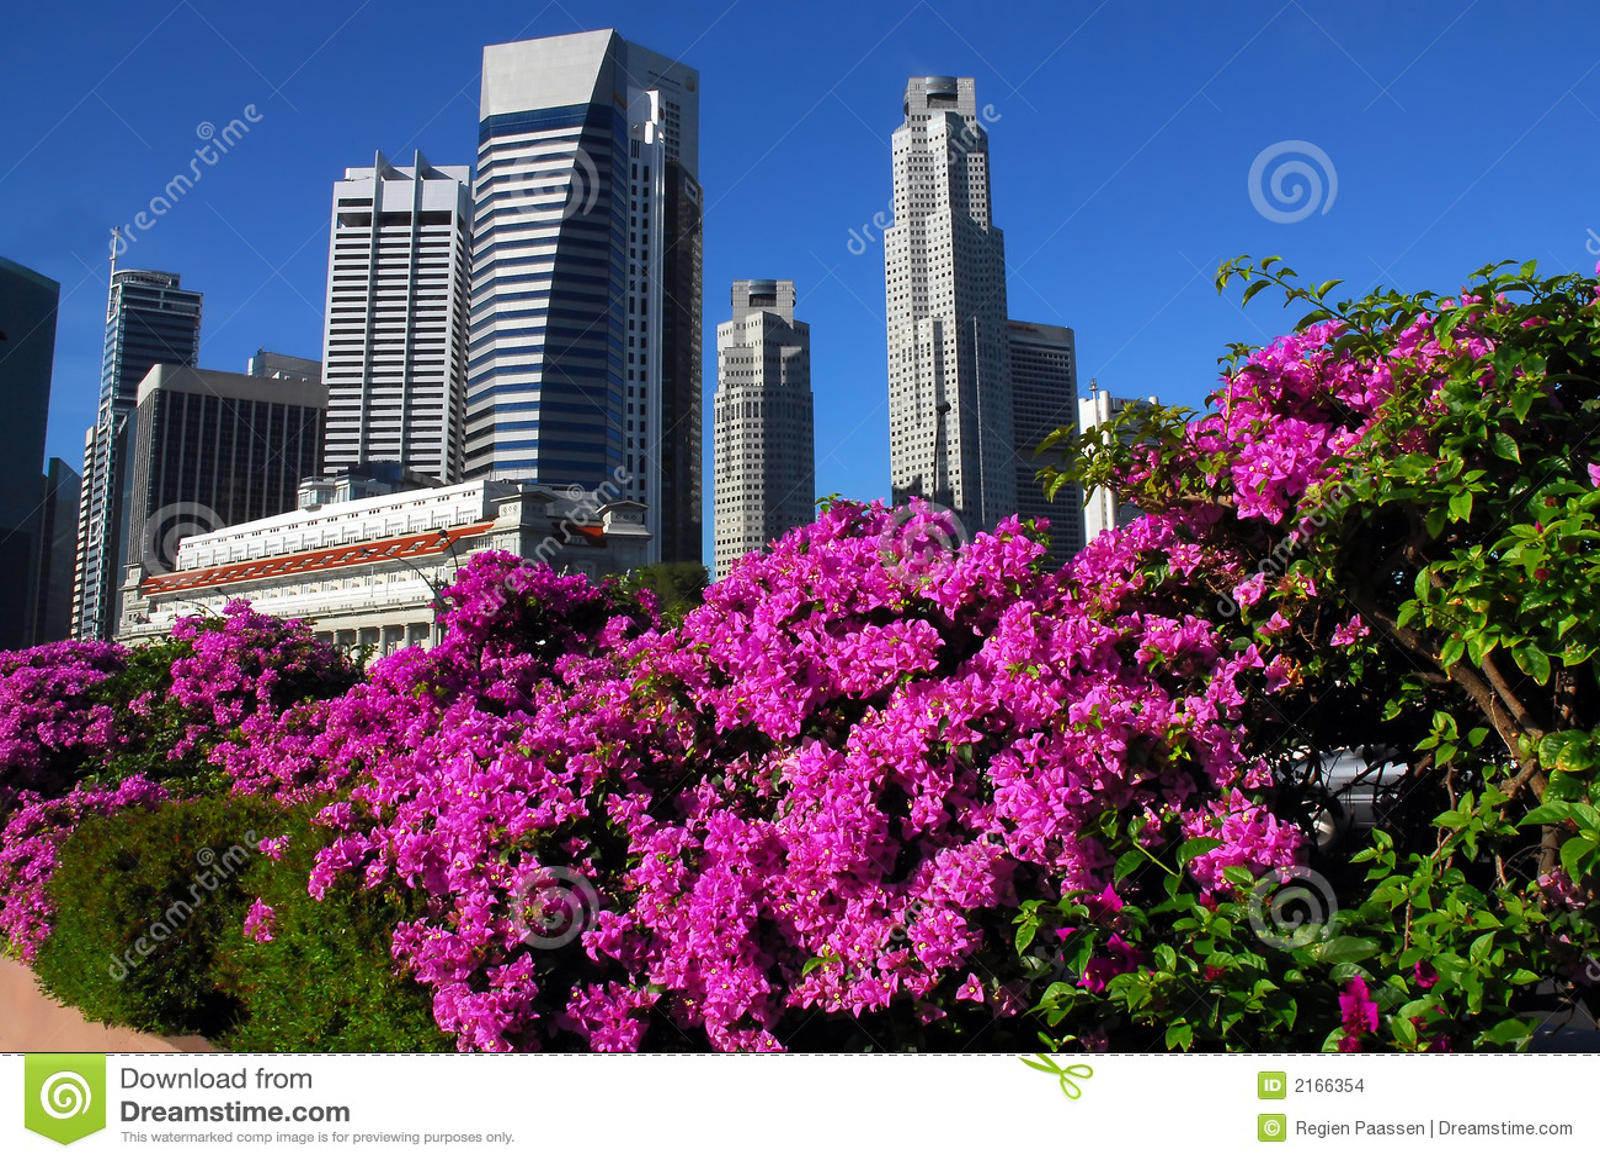 Bougainville singapore skyline